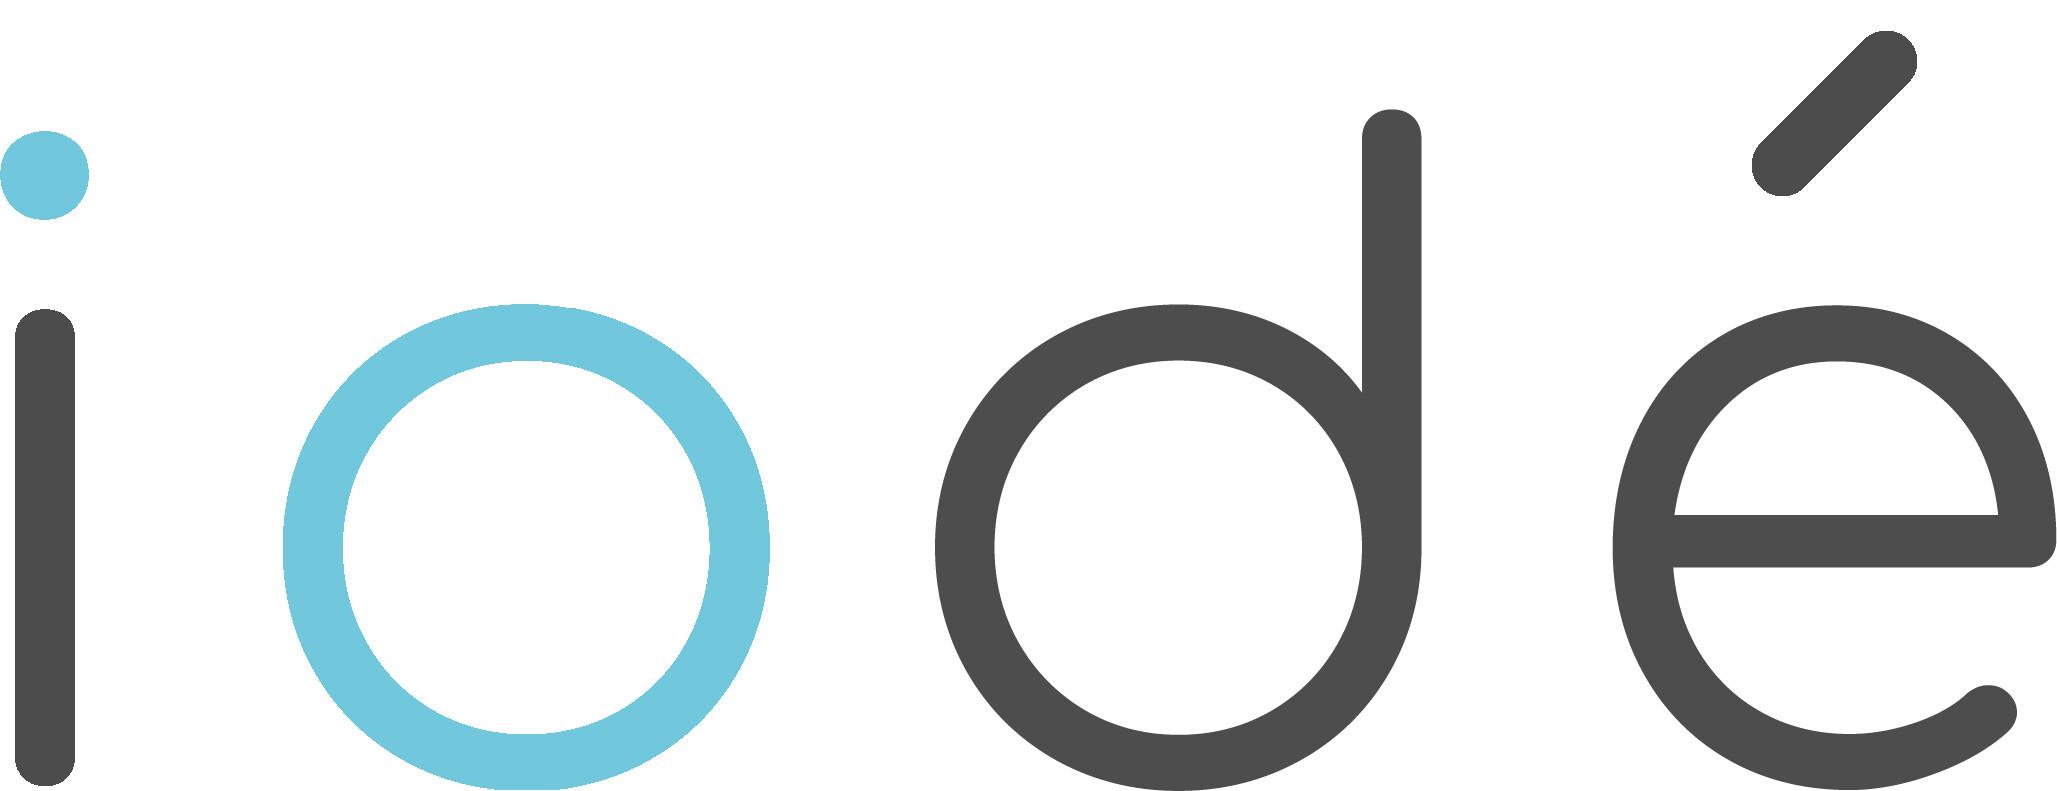 iodé community